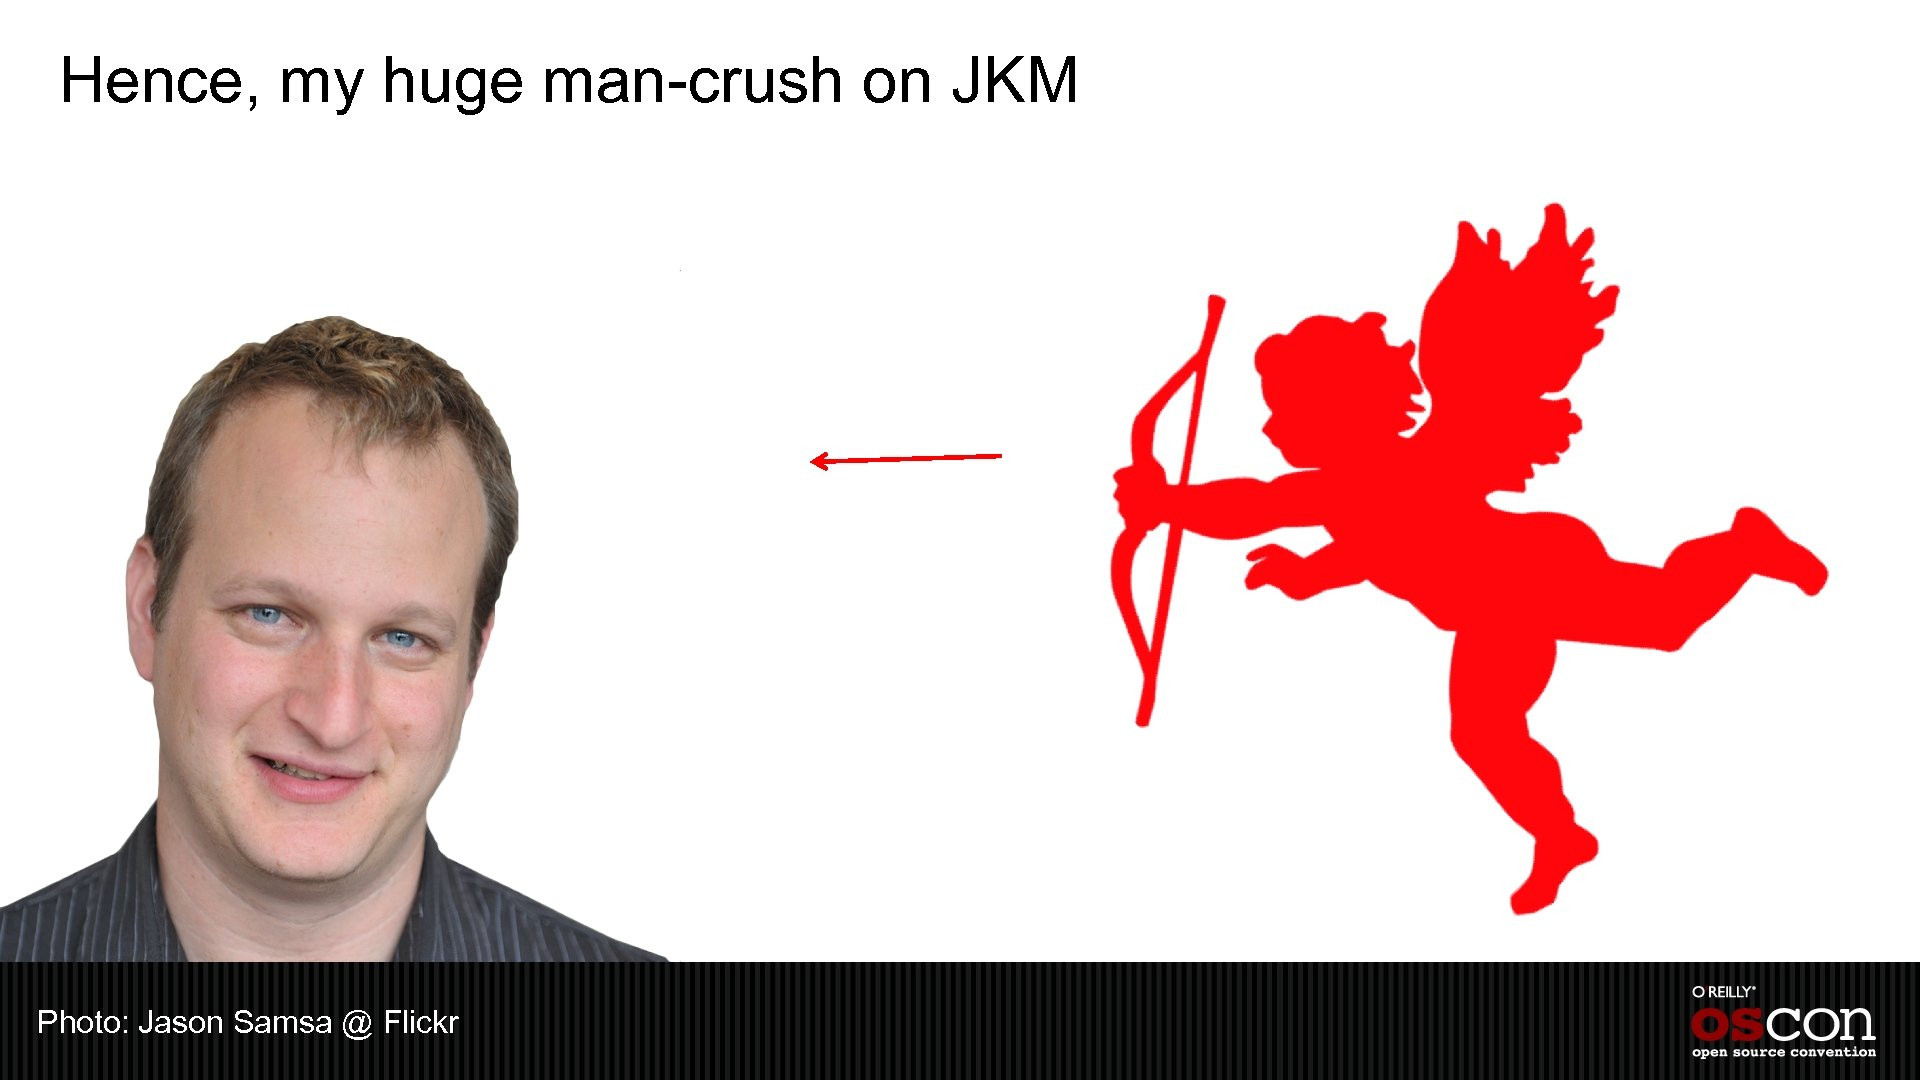 Hence, my huge man-crush on JKM Photo: Jason Samsa @ Flickr